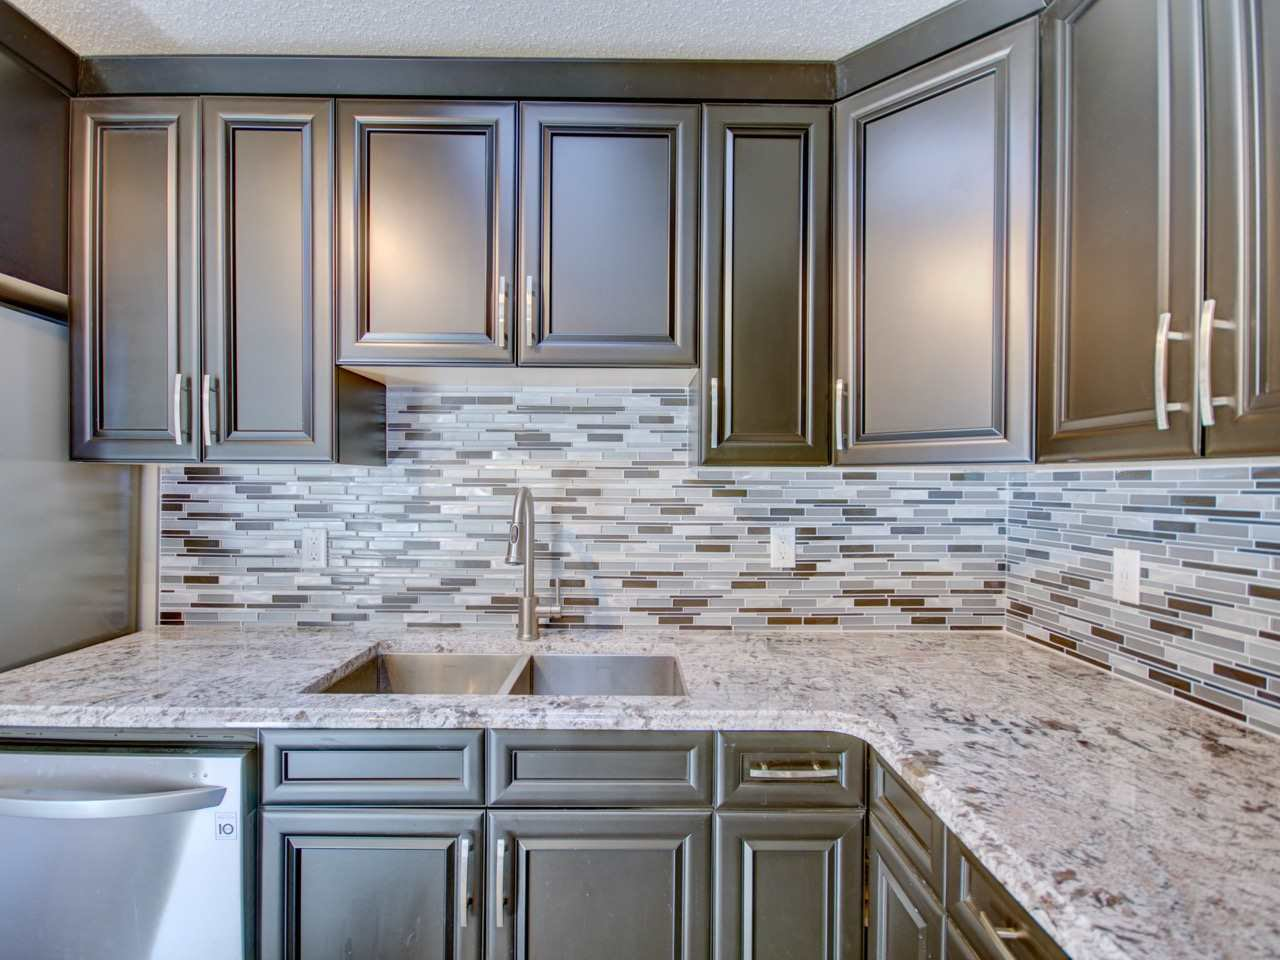 Main Photo:  in Edmonton: House for sale : MLS®# E4139030